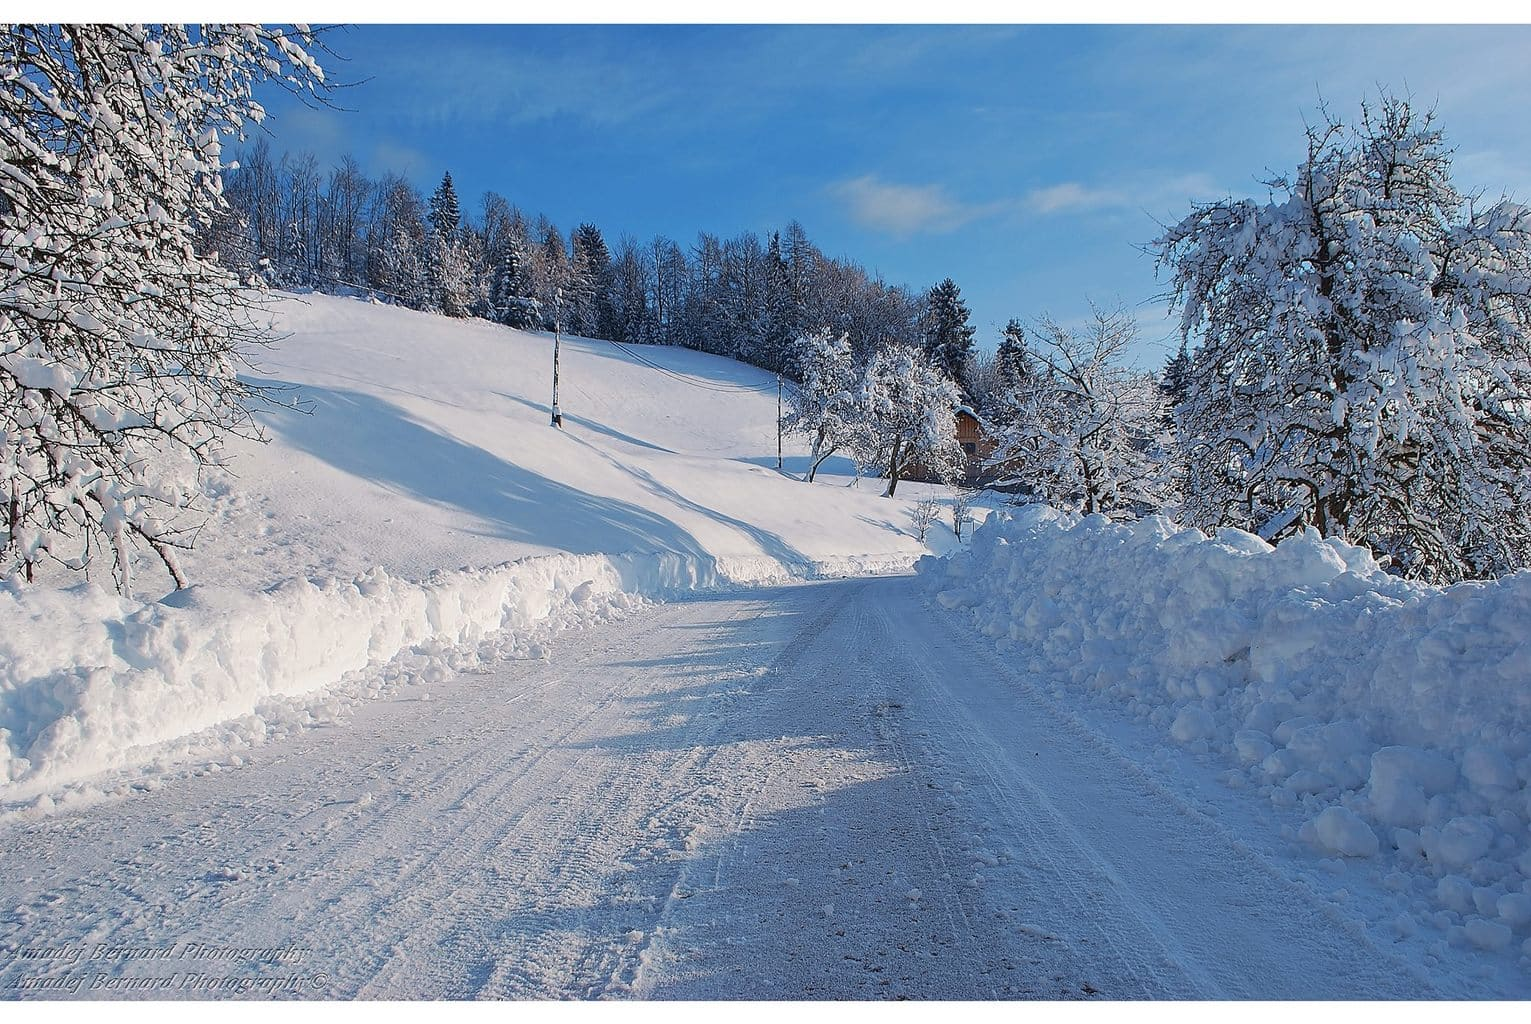 20 inch snow this morning, perfect Winter Idyll Stirpnik, Slovenia